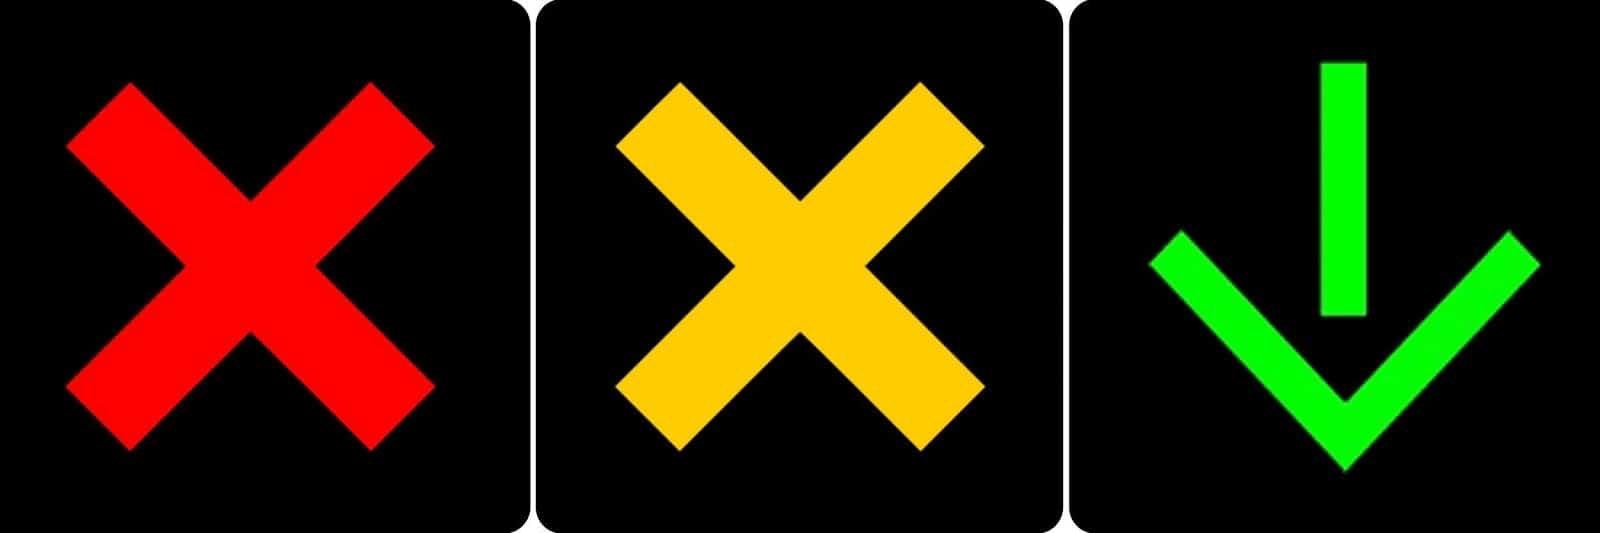 Lane use control signals